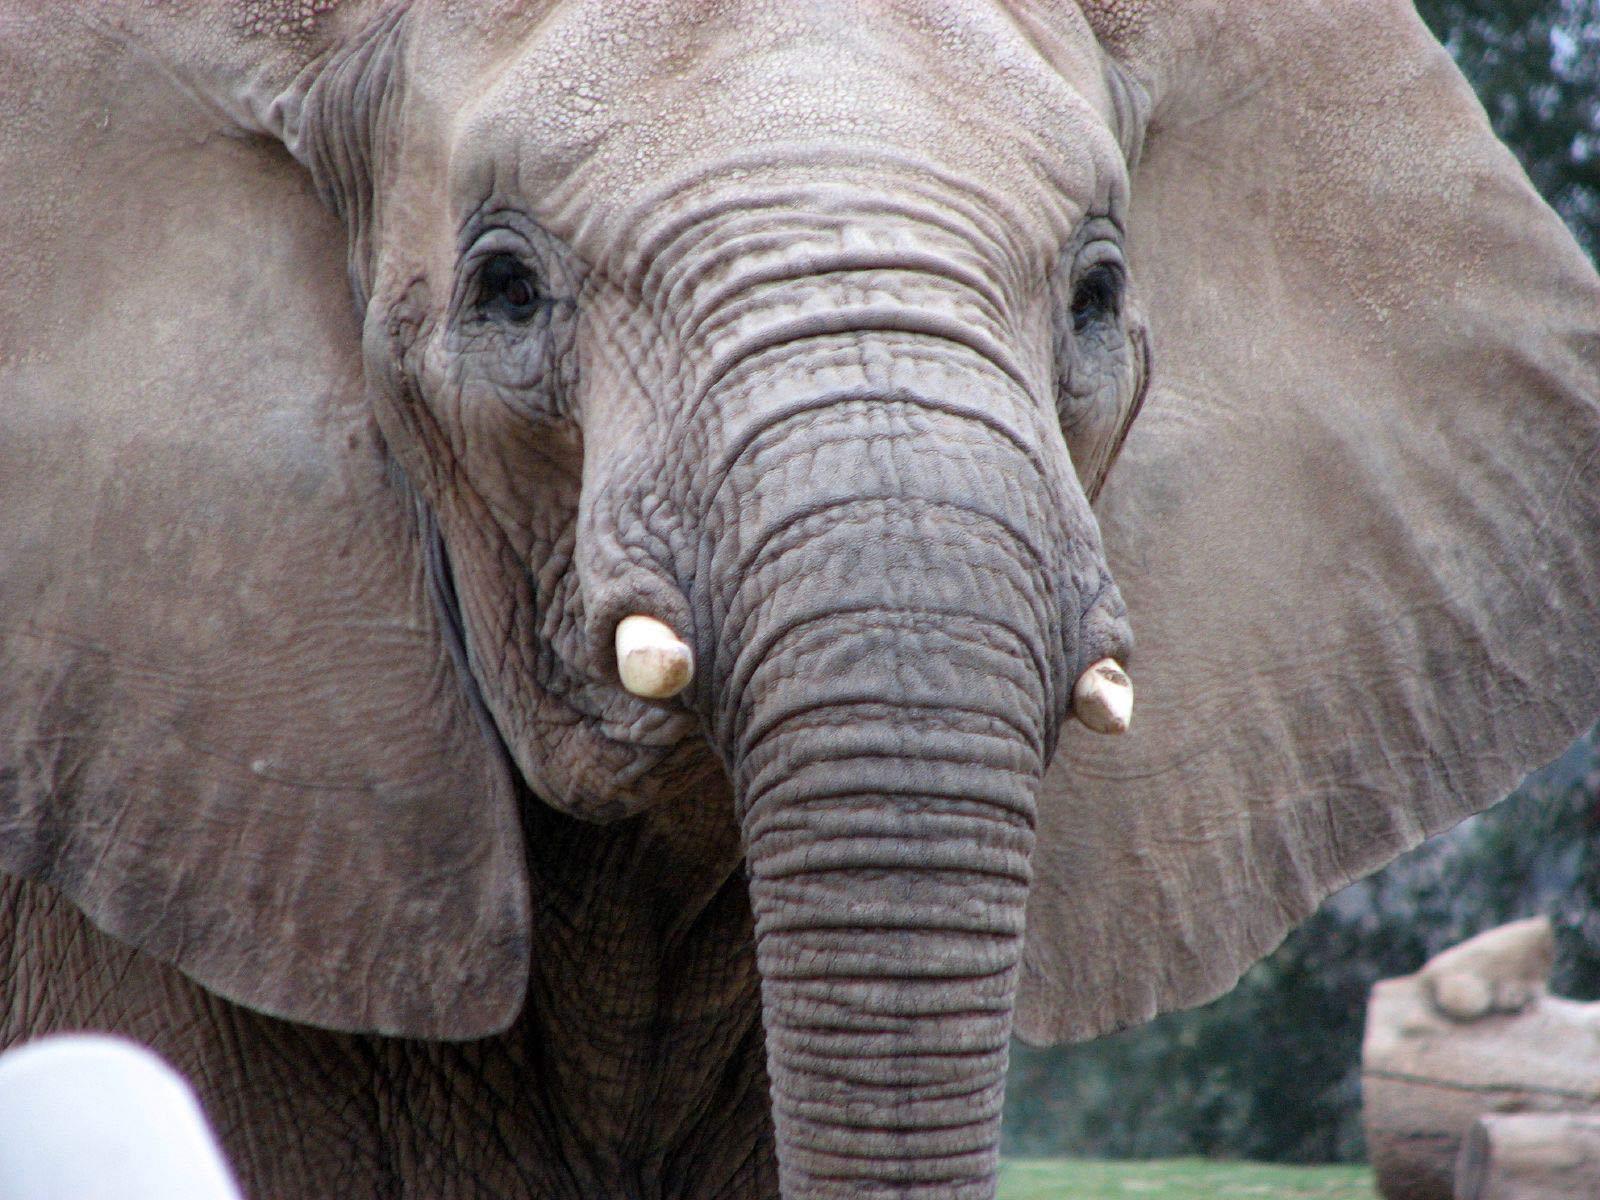 Http Piperbasenji Blogspot Com 2011 07 African Elephants Html